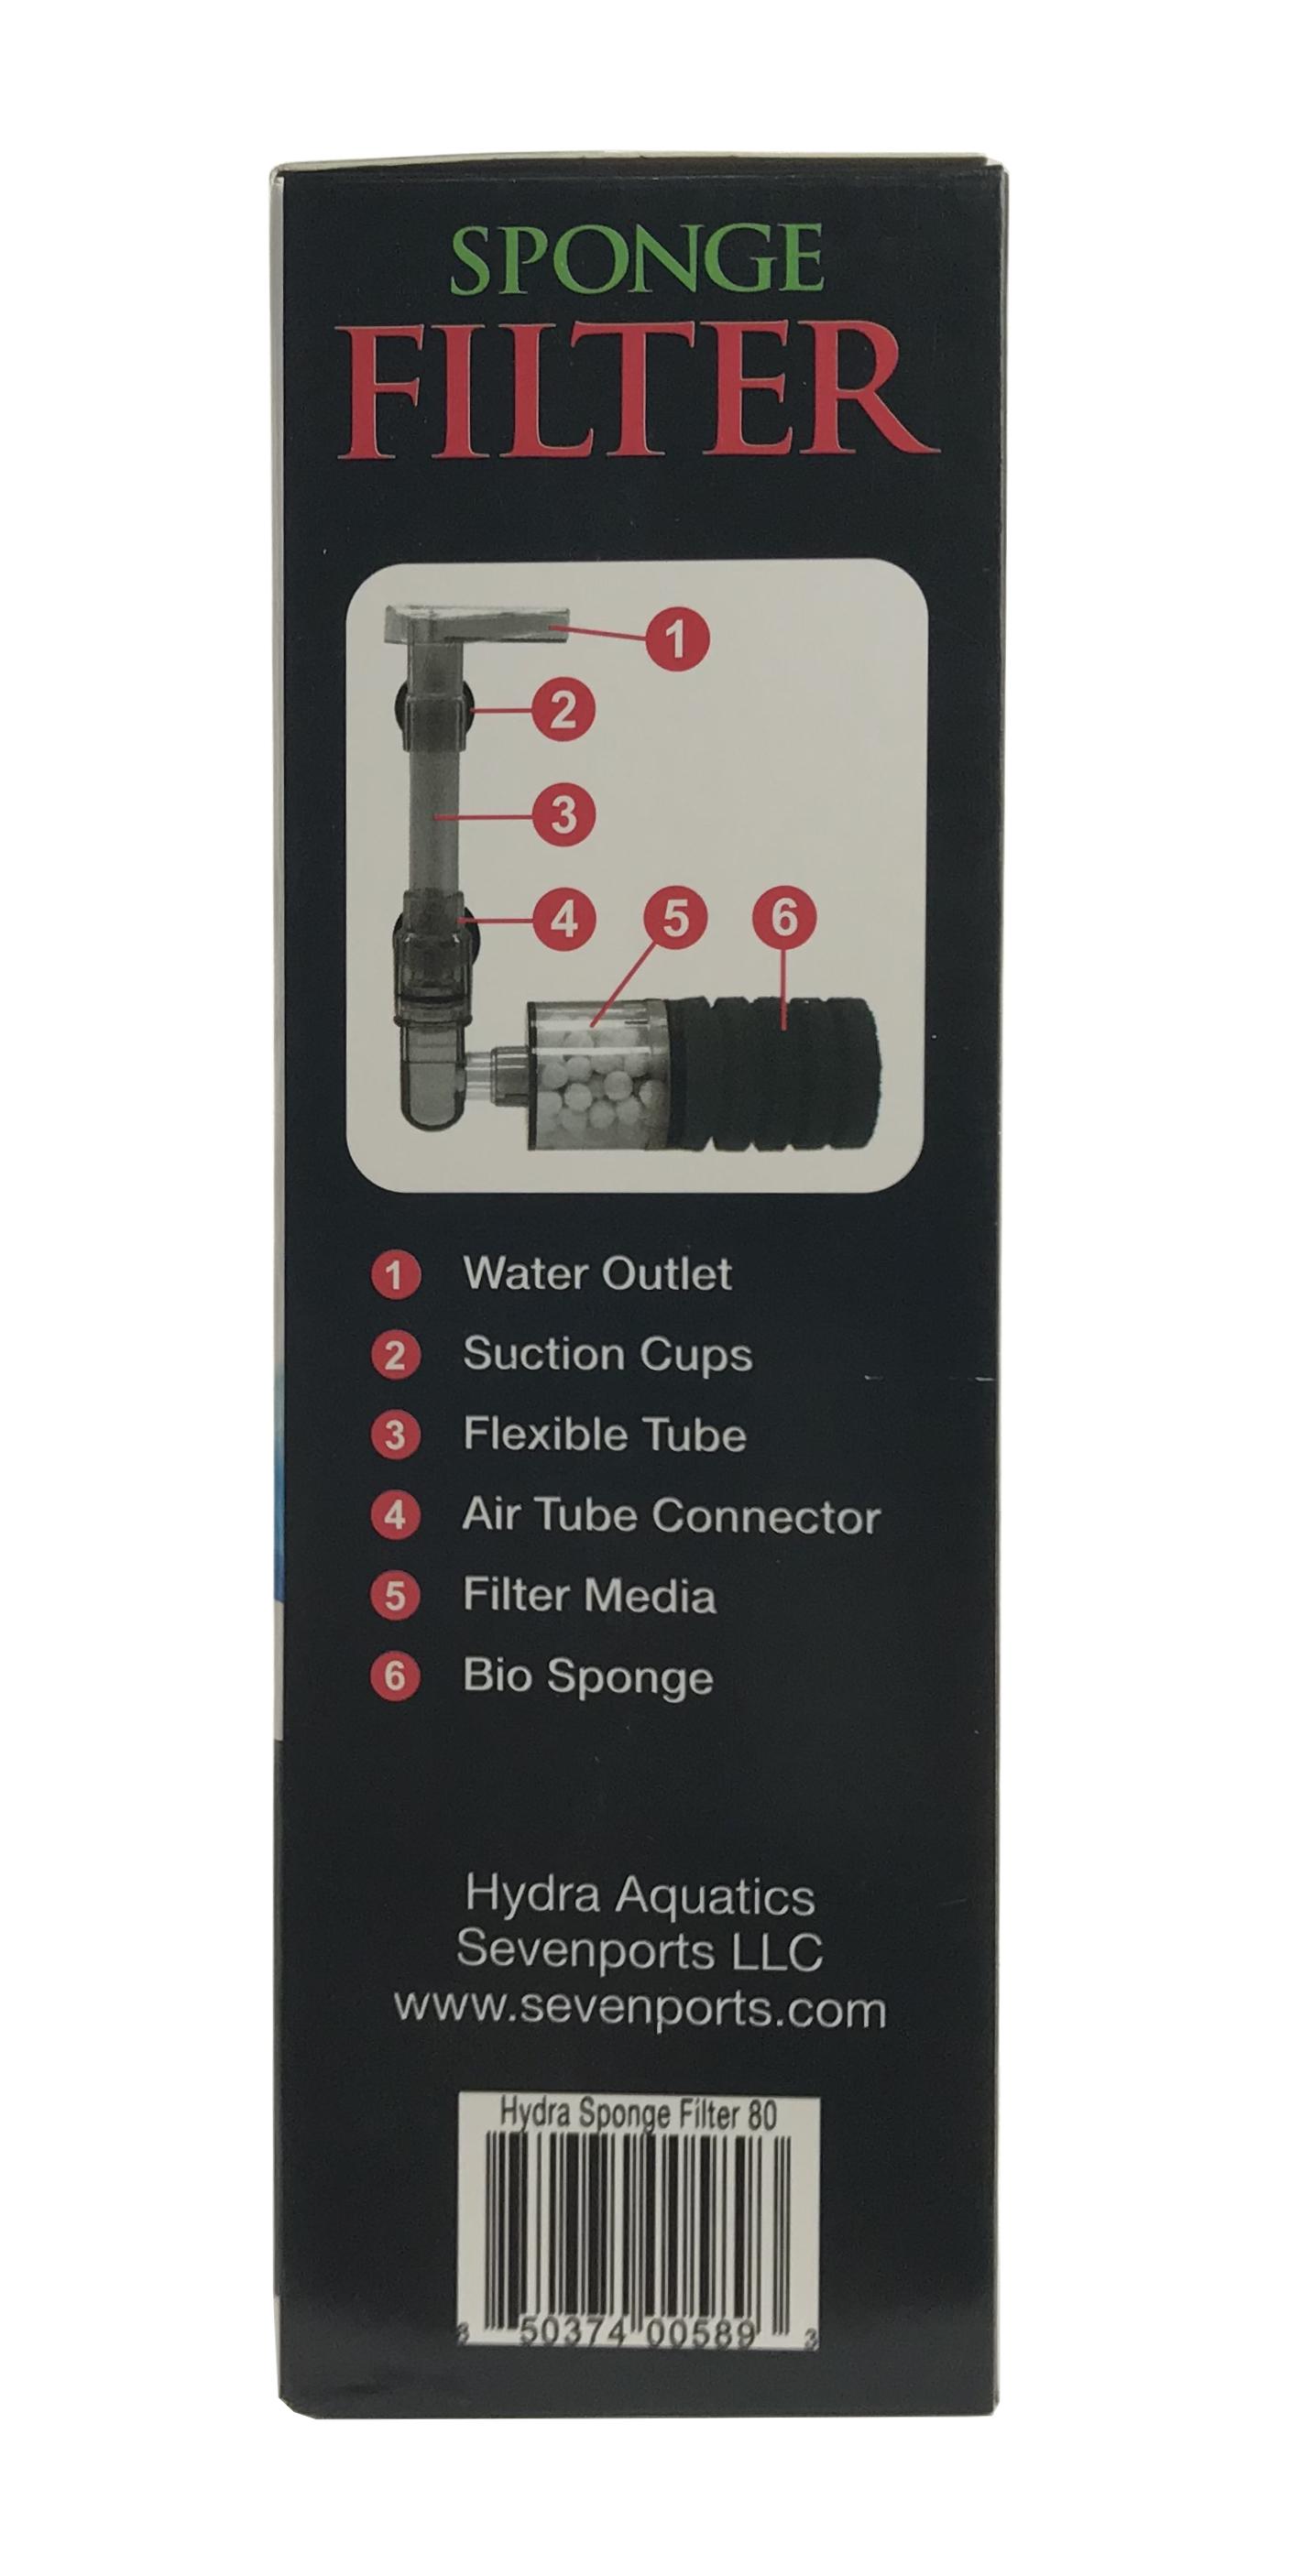 Hydra High Efficiency Sponge Filter 80